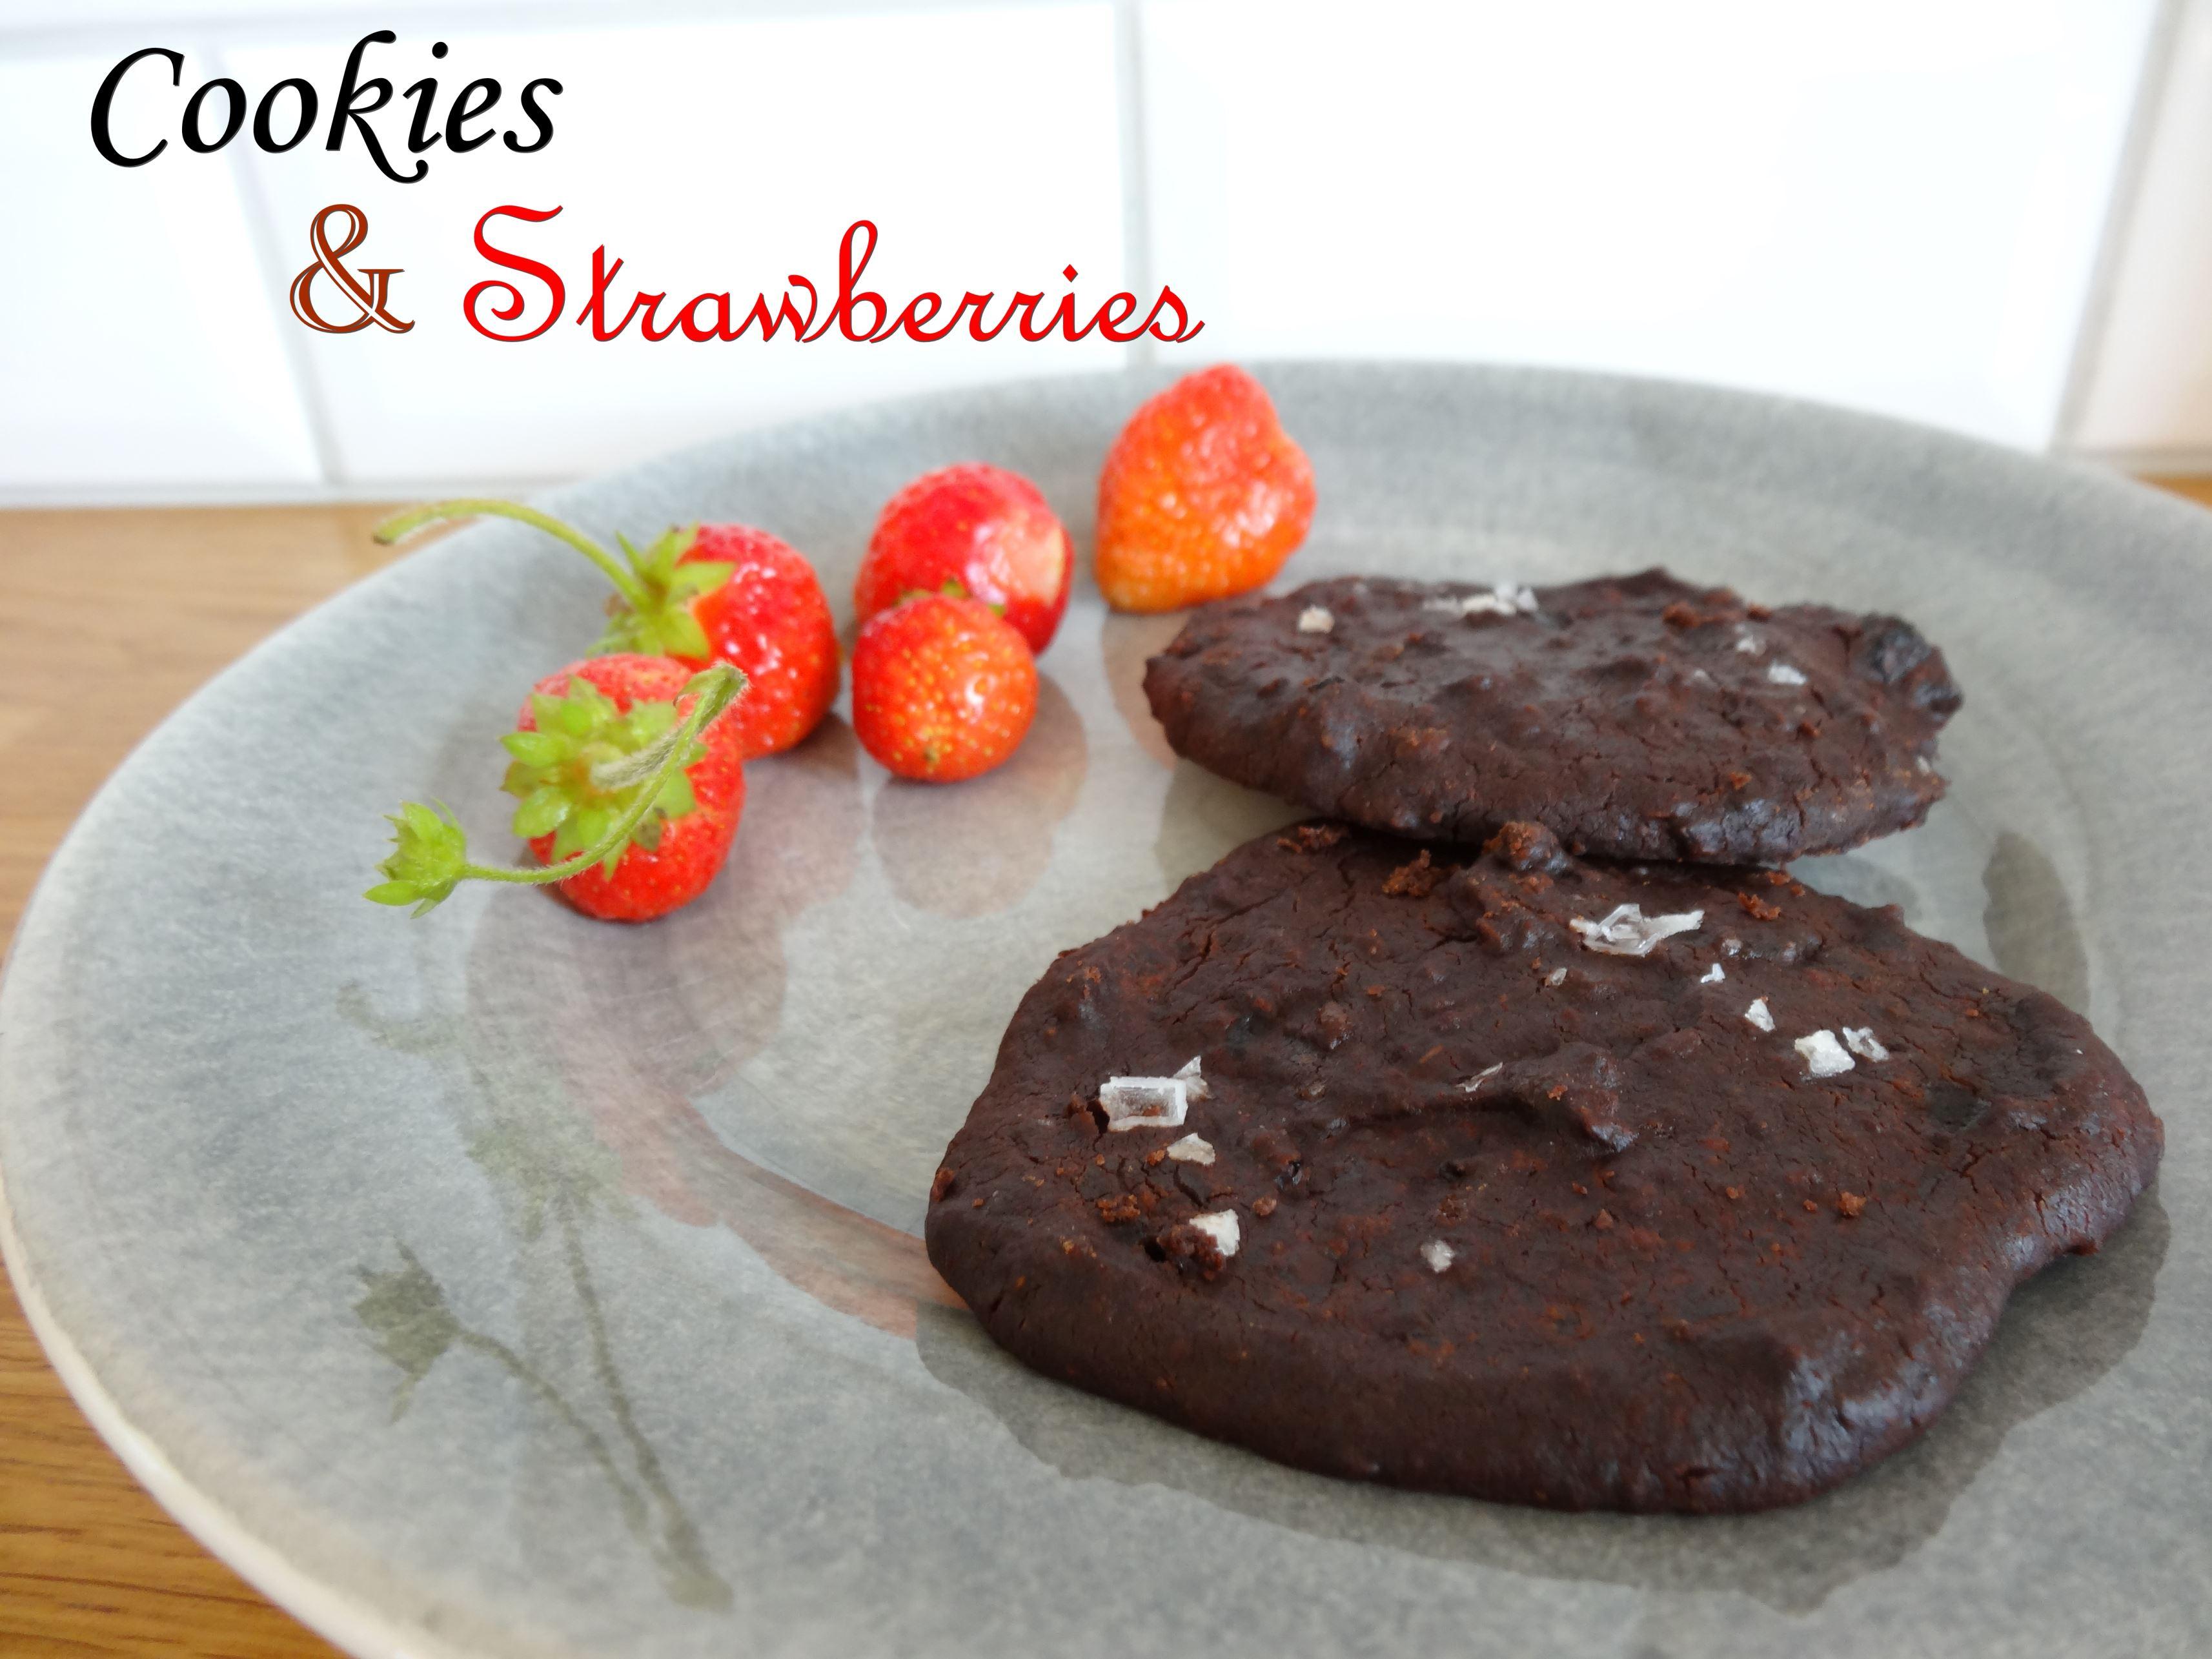 Black bean chocolate chili cookies and strawberries